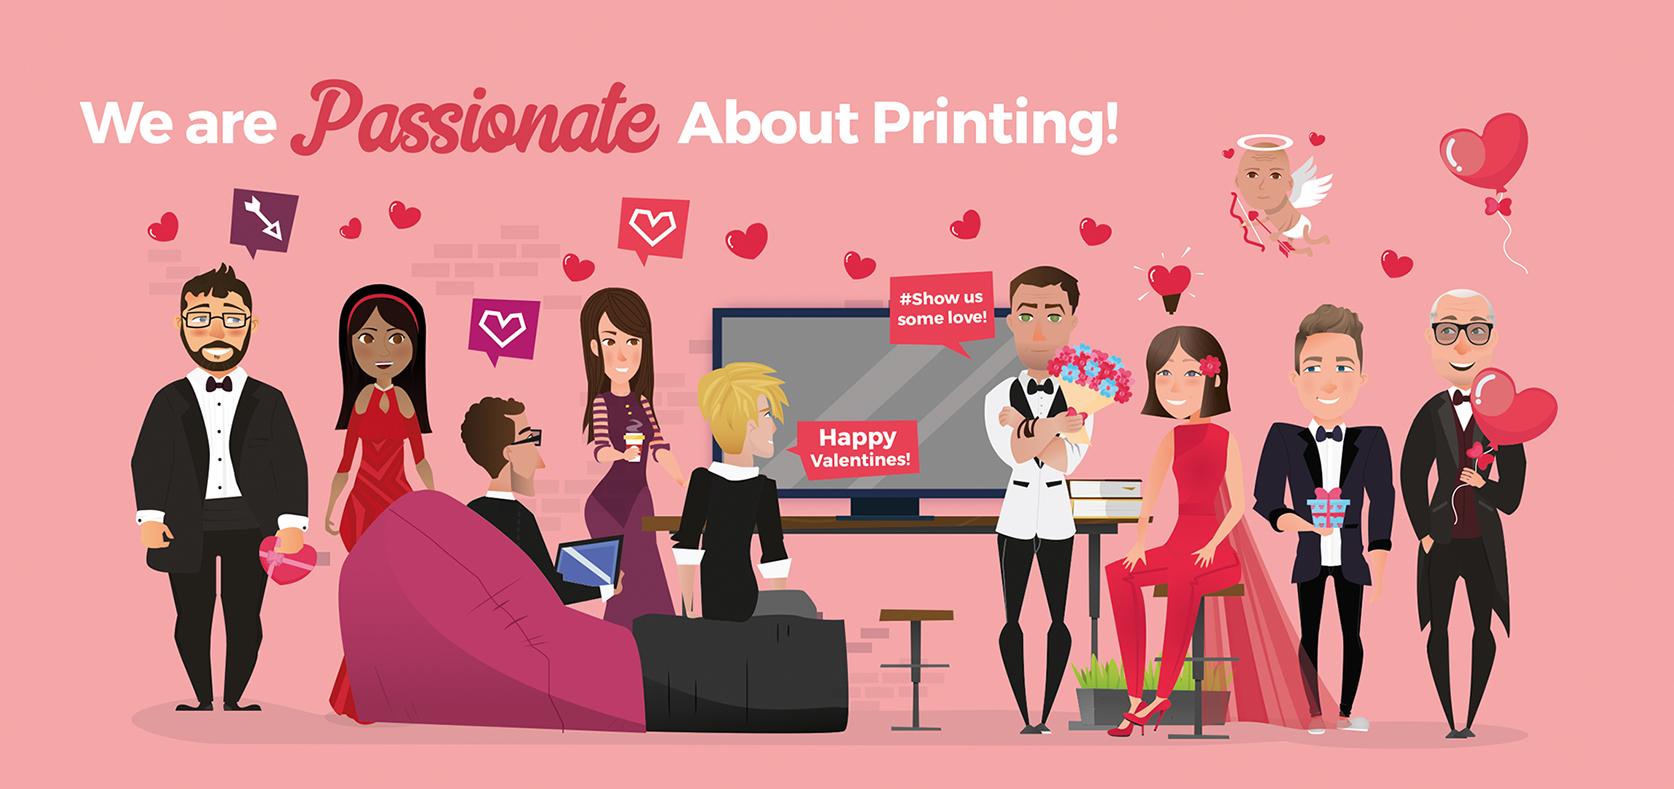 We love print